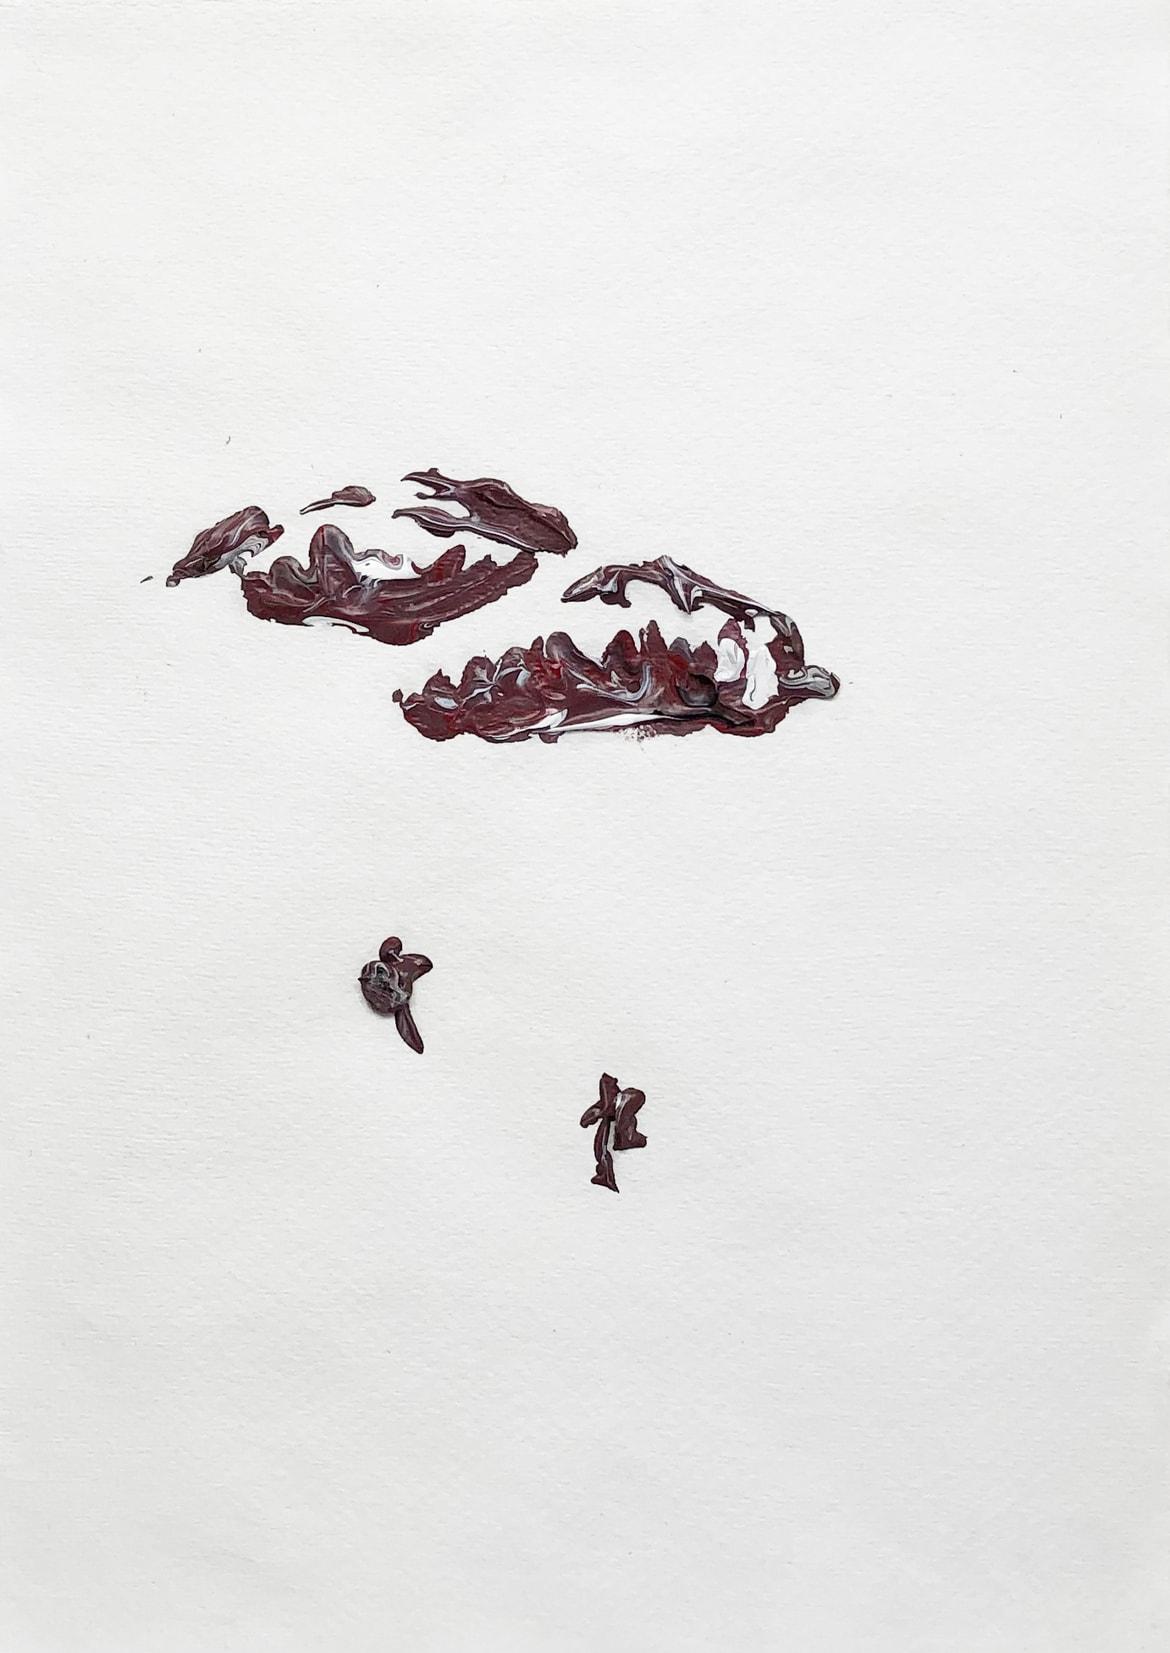 Clemens Krauss 'Rainy Season' (From the series '2017-2021'), 2020, acrylic on paper, framed, 36 x 27 cm